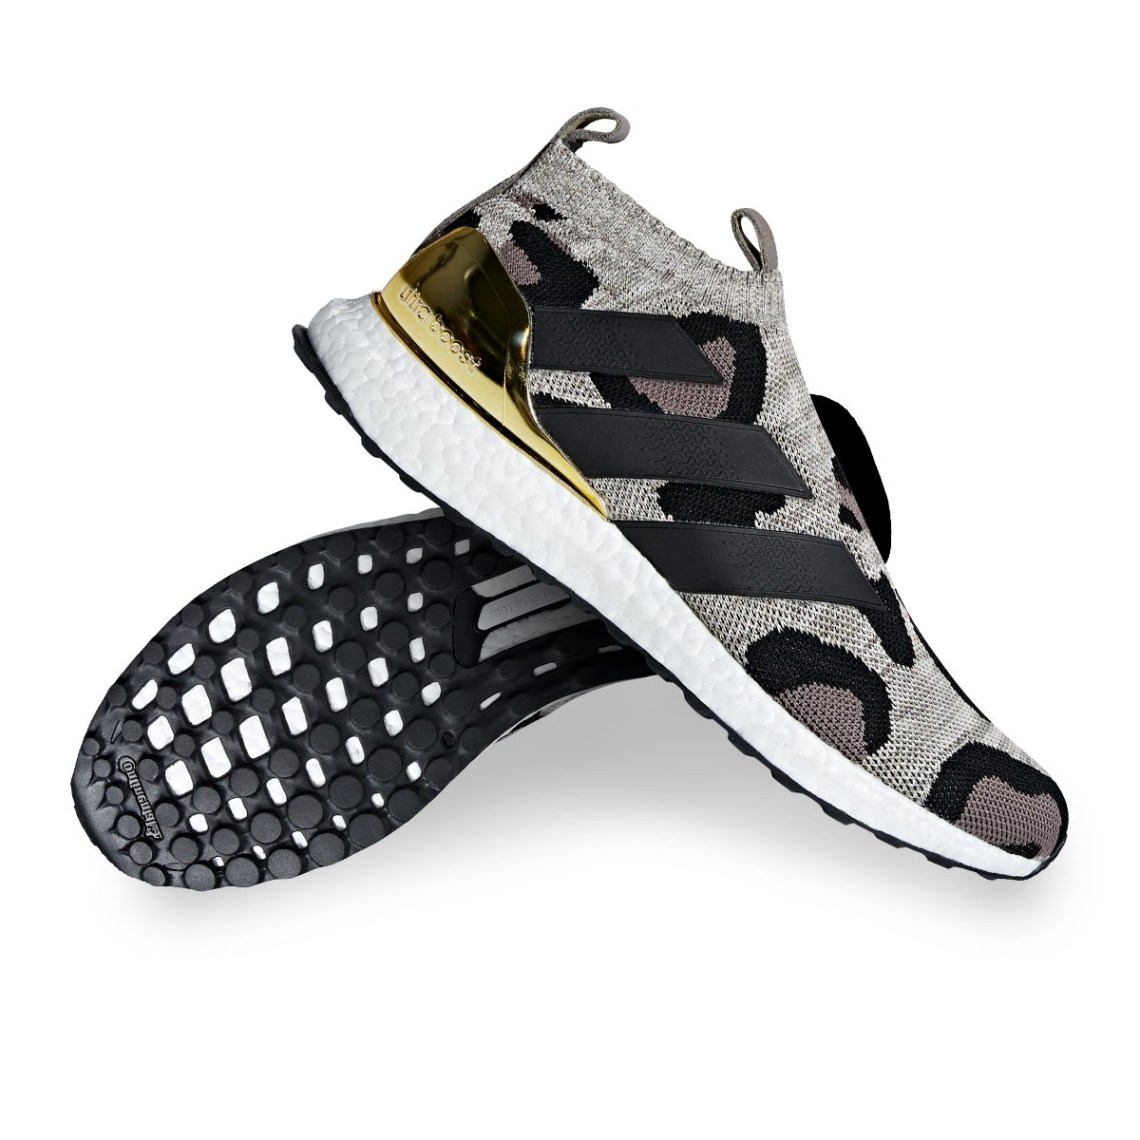 Adidas Ace 16 6